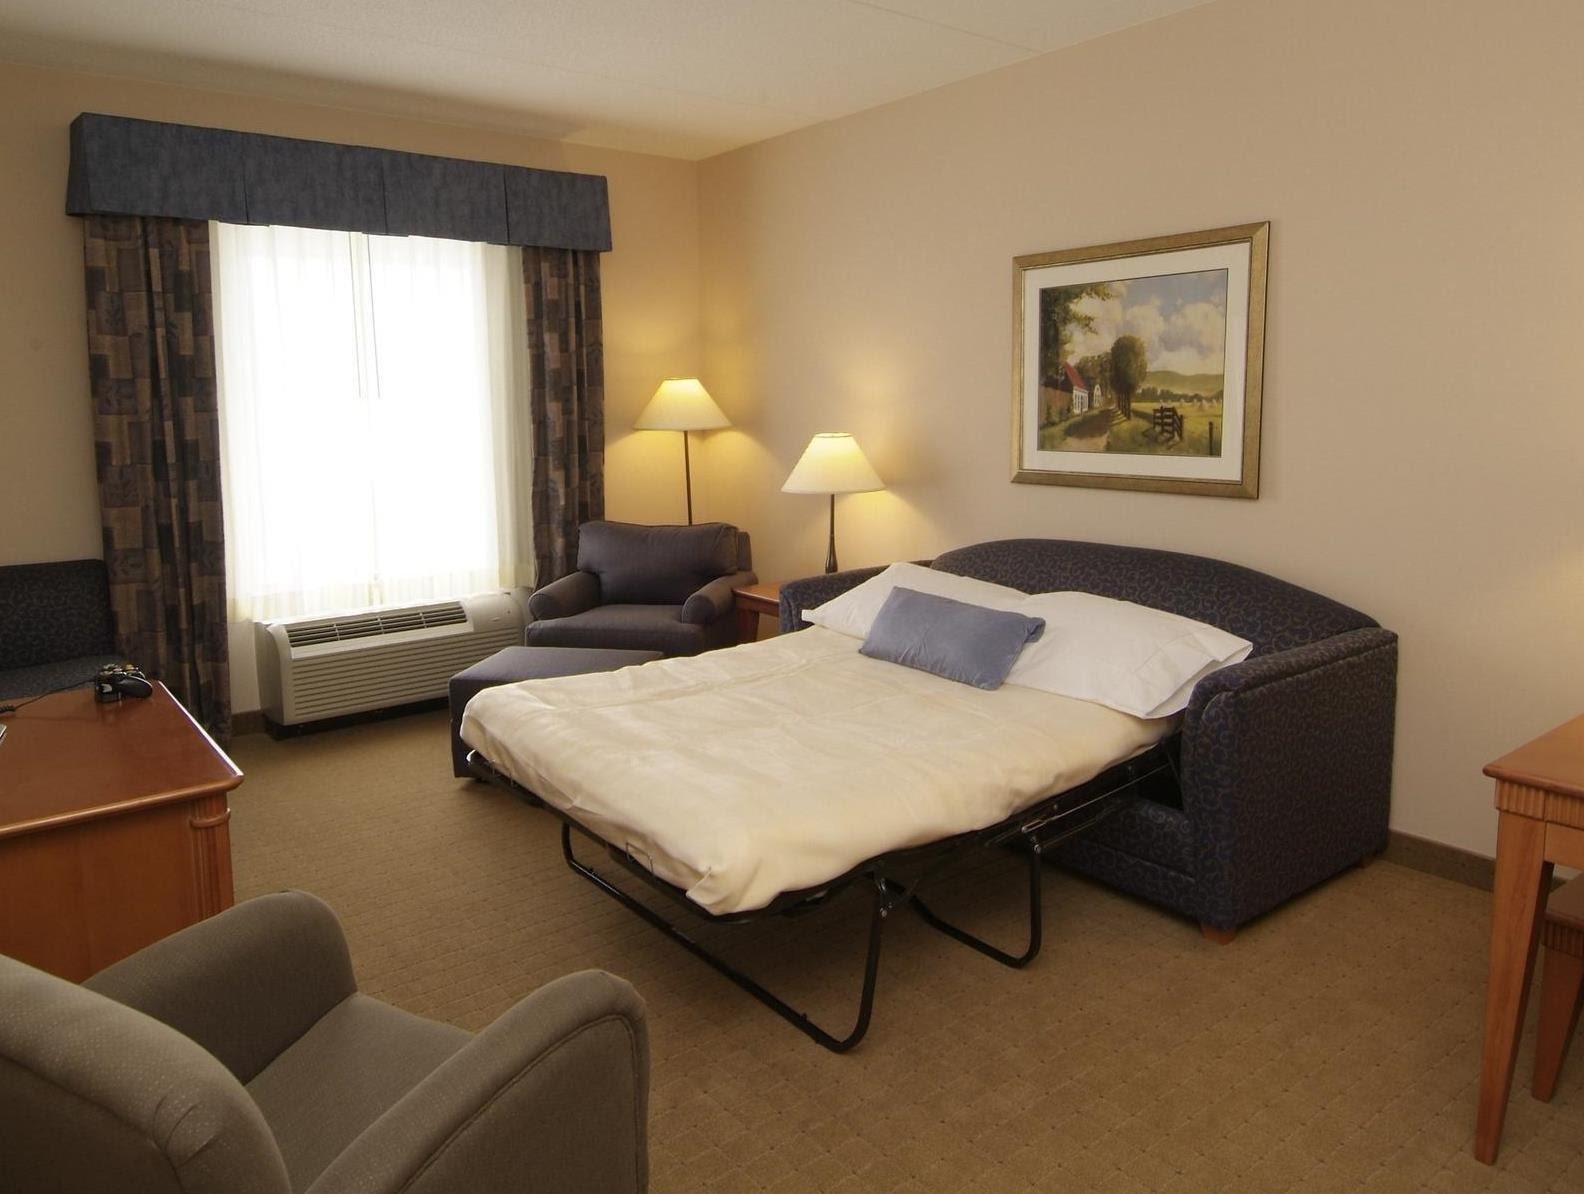 Price Hampton Inn and Suites Guelph Ontario